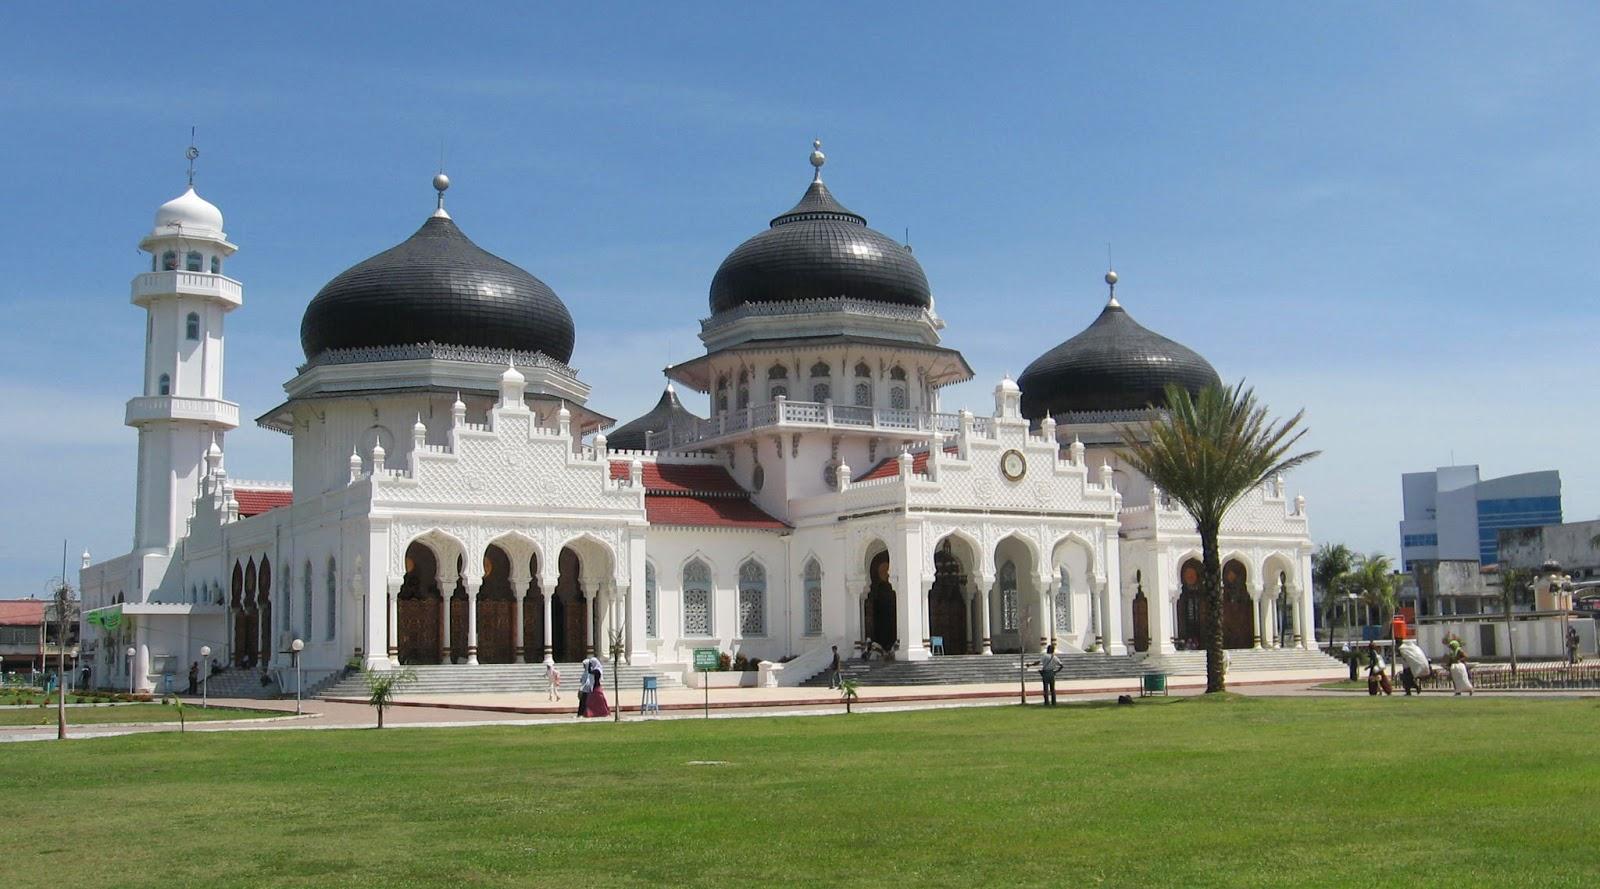 Masjid Raya Baiturrahman wisata indonesia paling indah